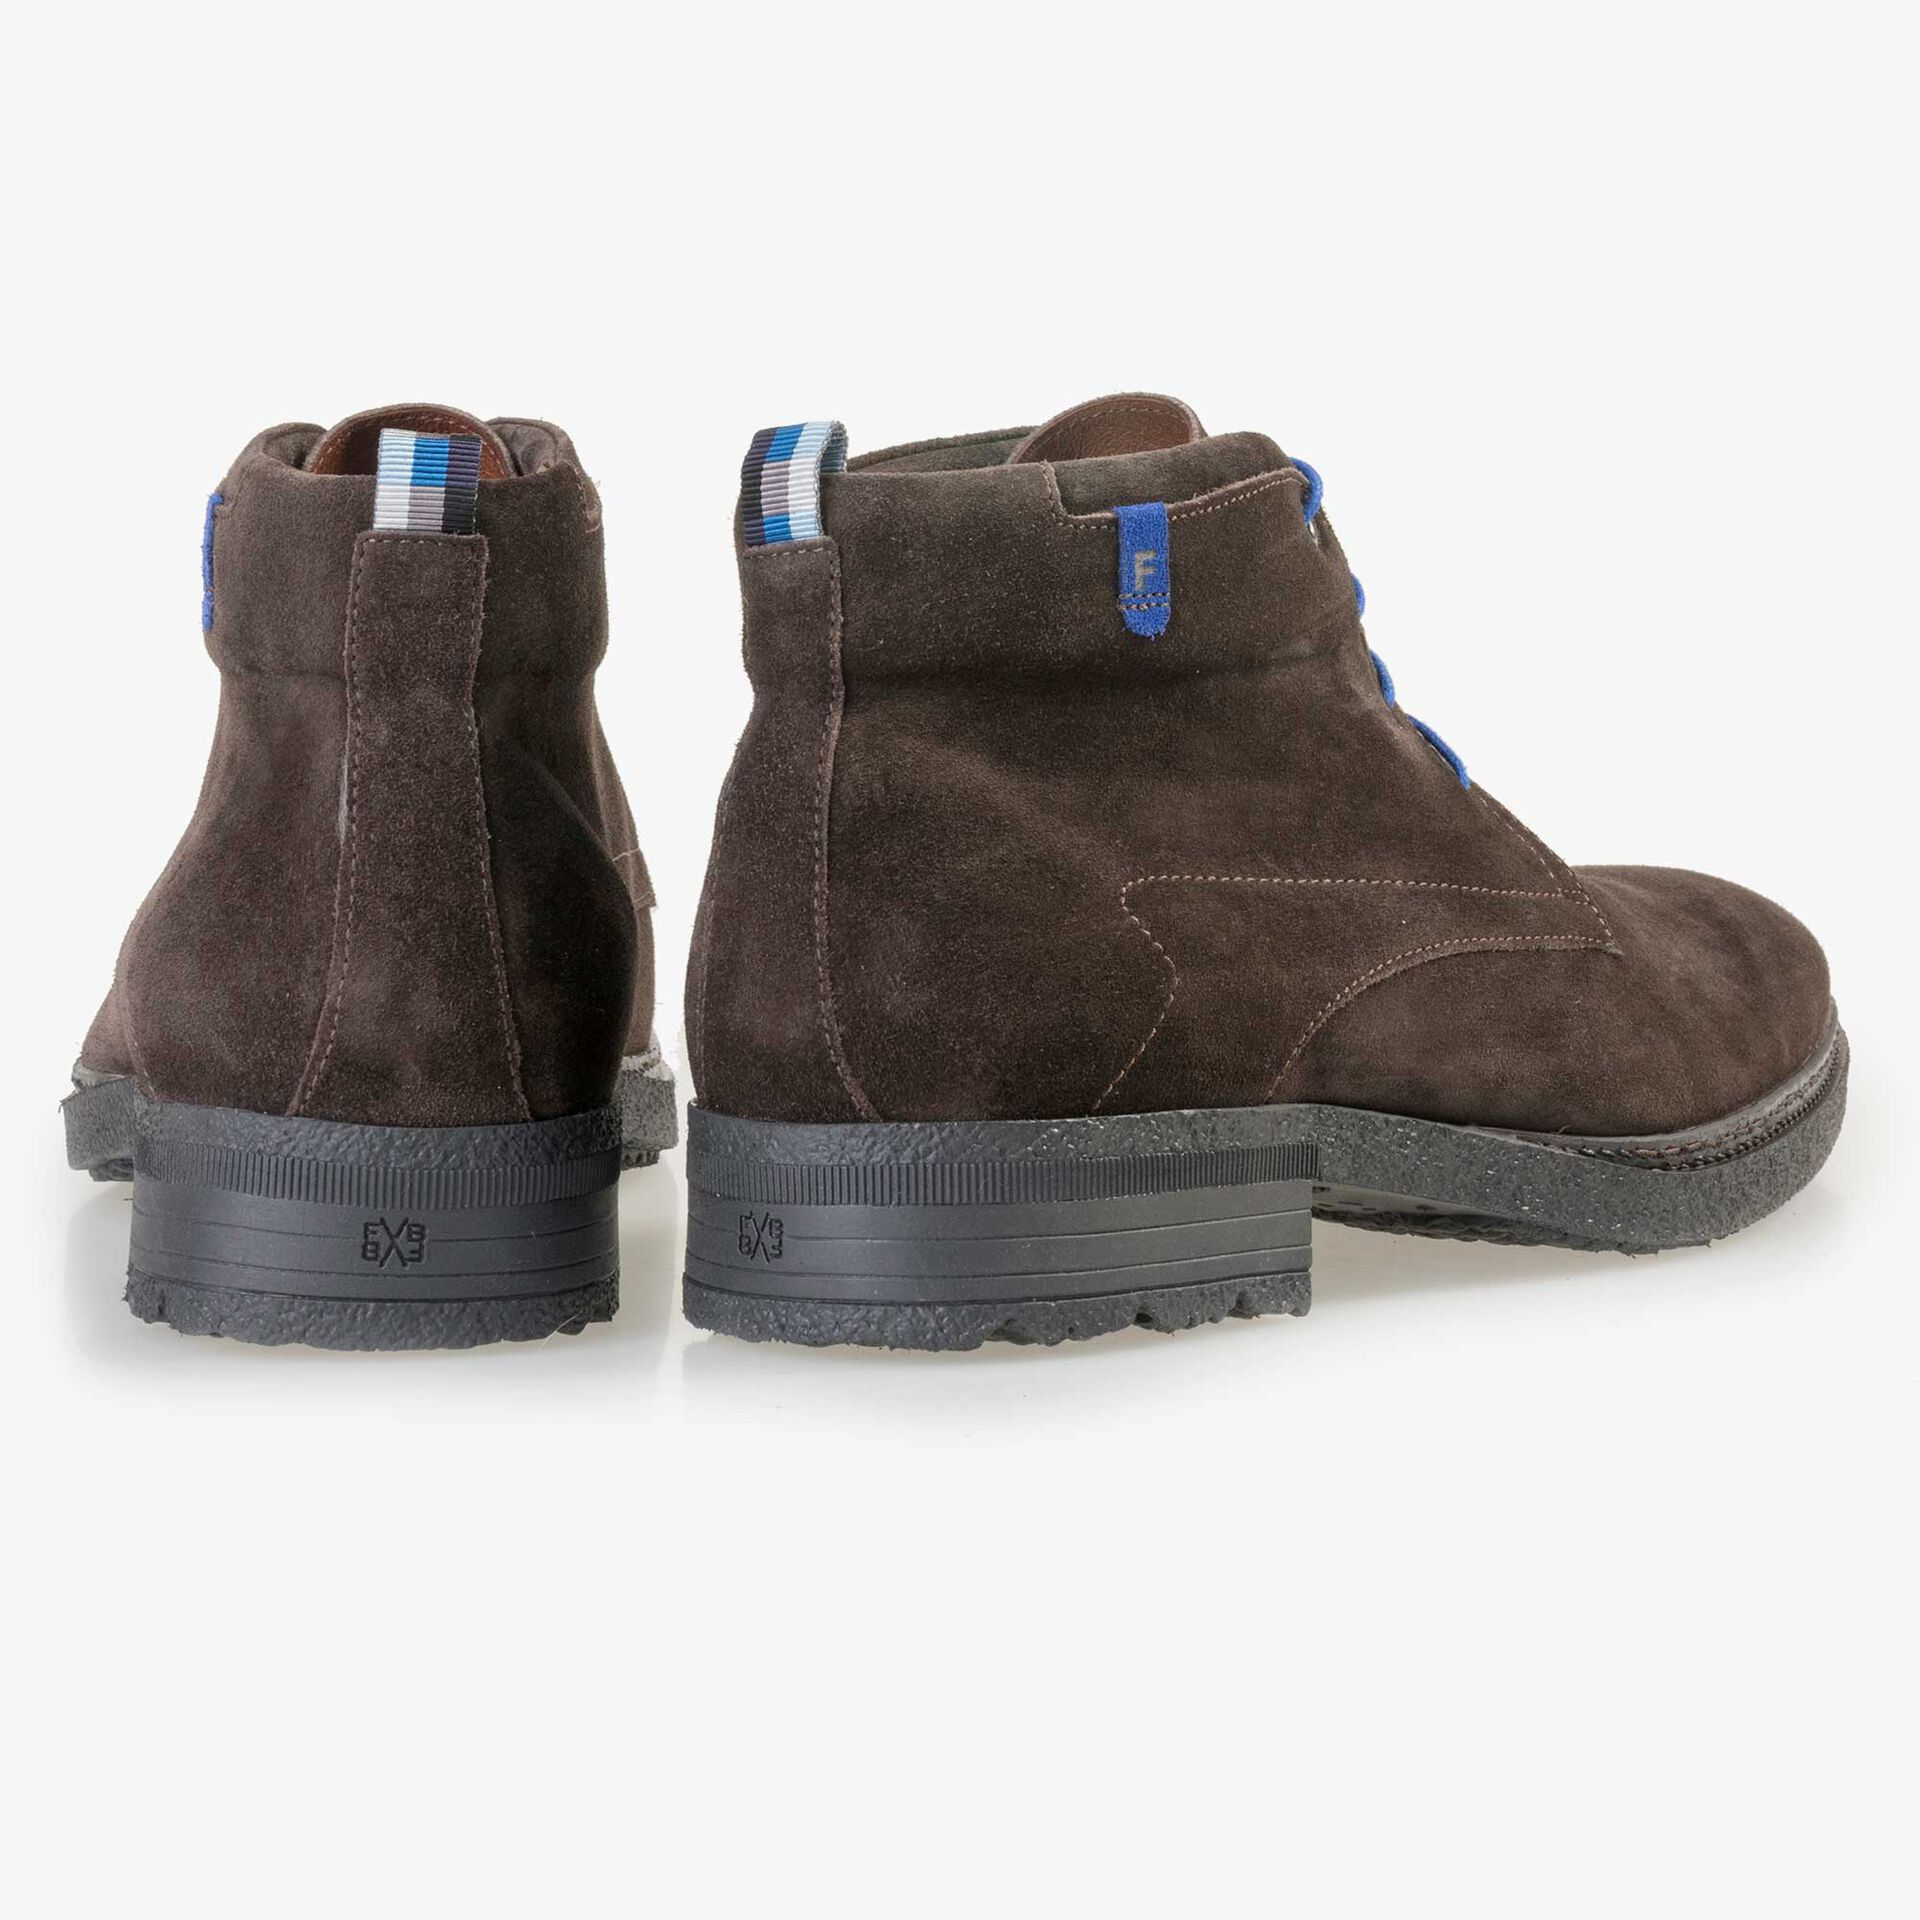 Floris van Bommel men's dark brown suede leather lace boot